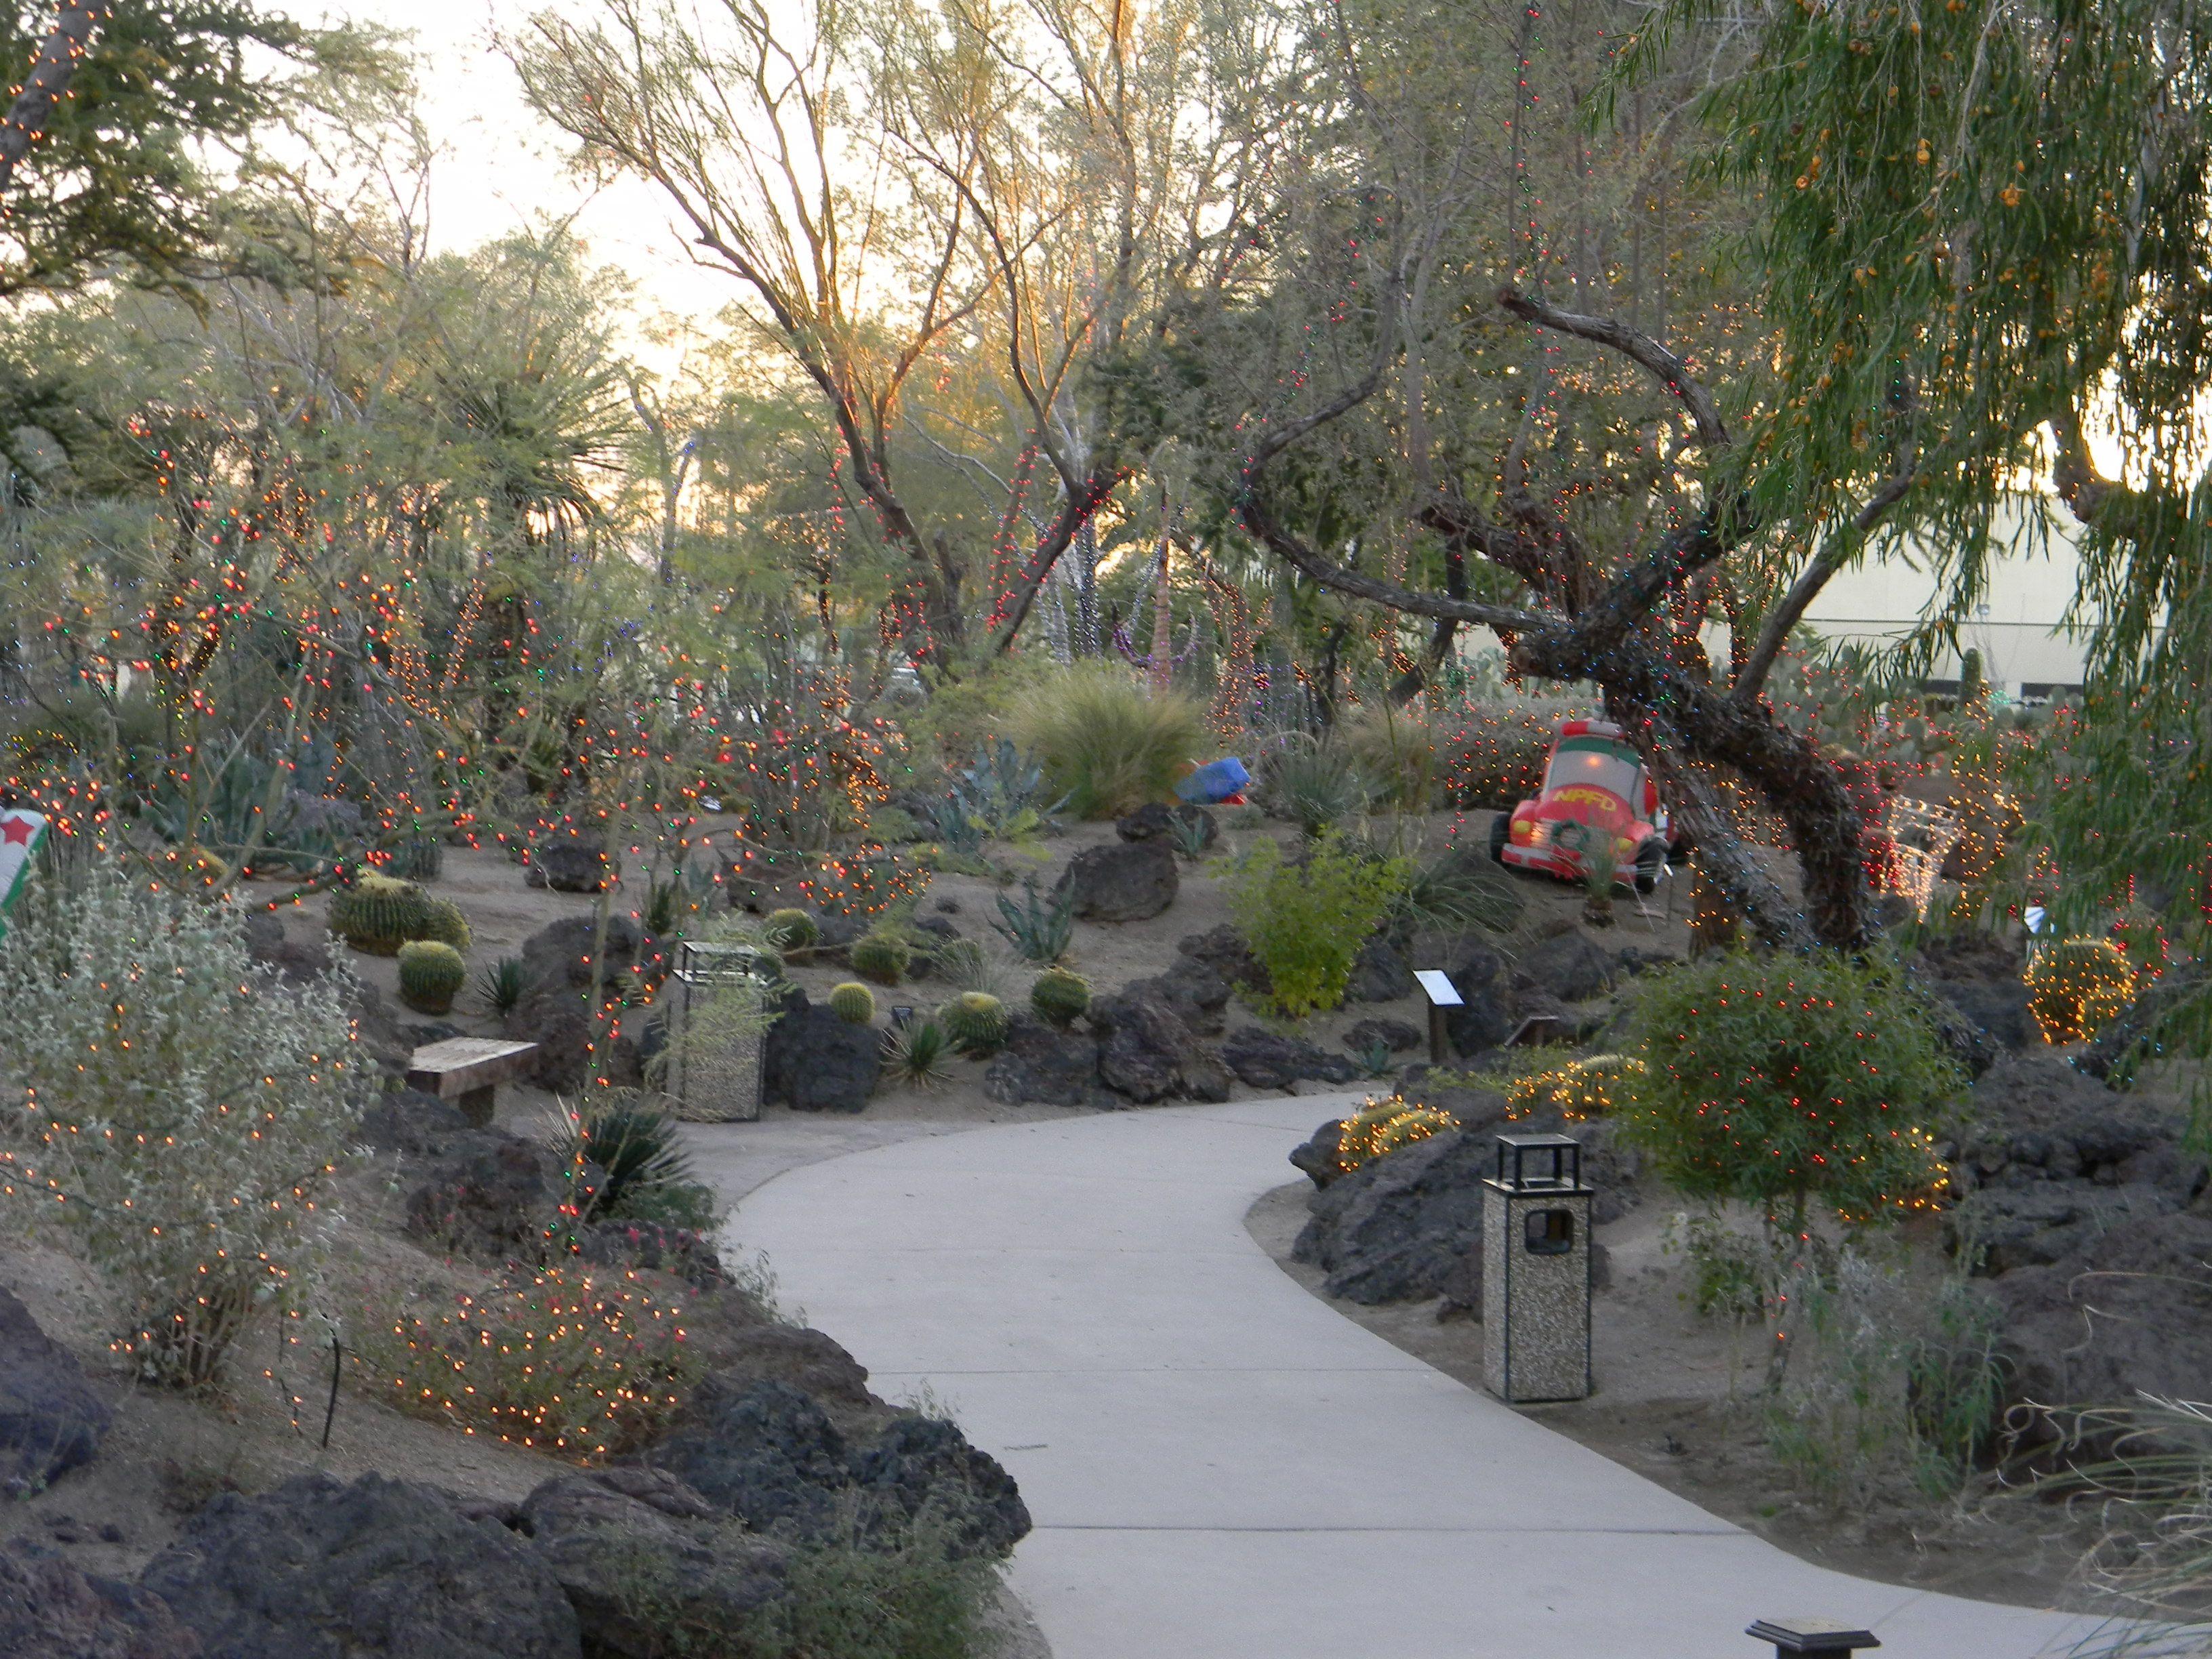 24ae92d3f3f63d73d118480804cc7a16 - Ethel M Chocolate Factory And Botanical Cactus Gardens Las Vegas